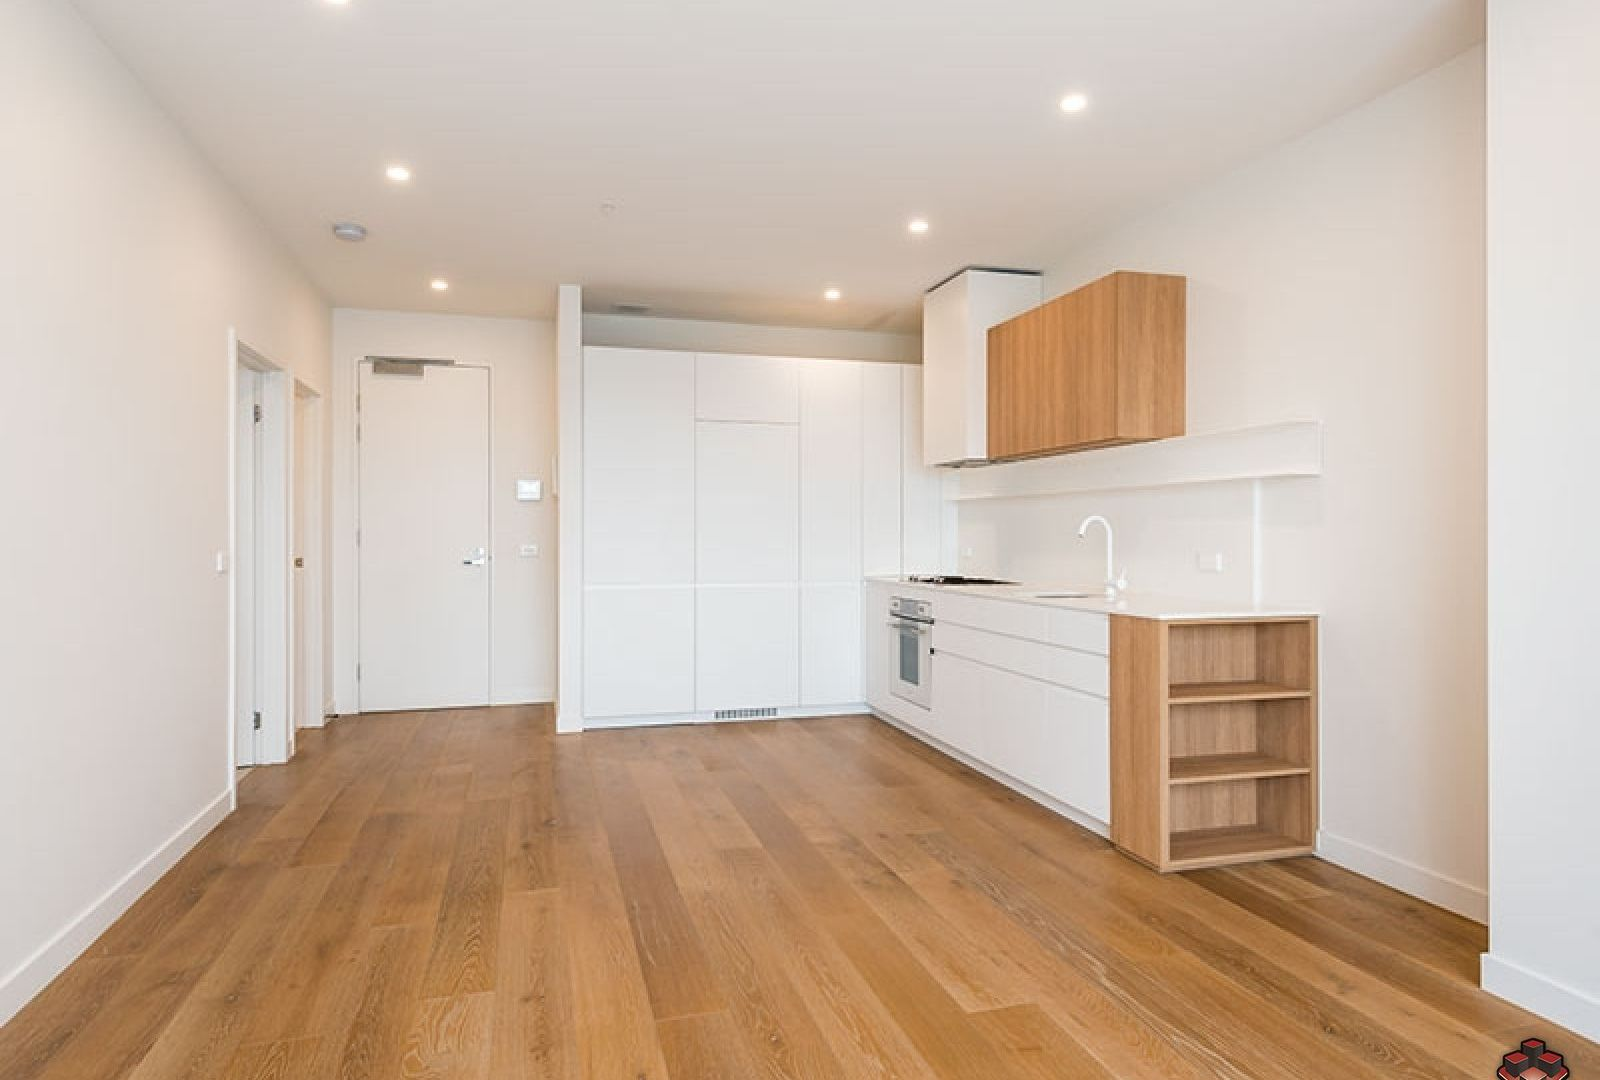 Apartment 205/ 14 -1 Maroona Road, Carnegie VIC 3163, Image 1